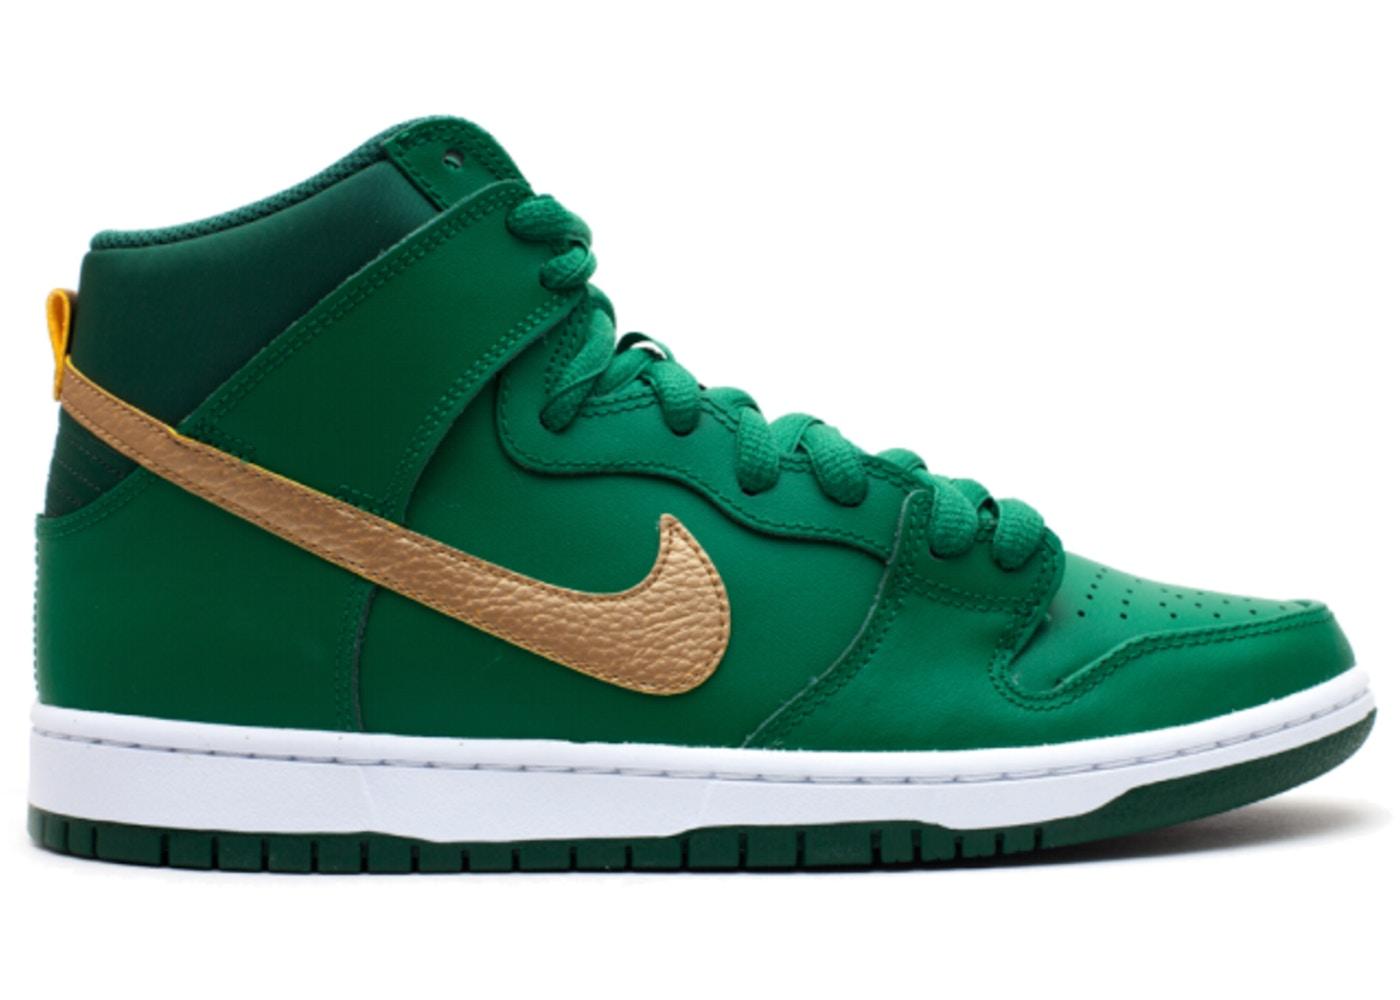 b8fde82e10 Nike Dunk SB High St Patty's Day - 305050-373